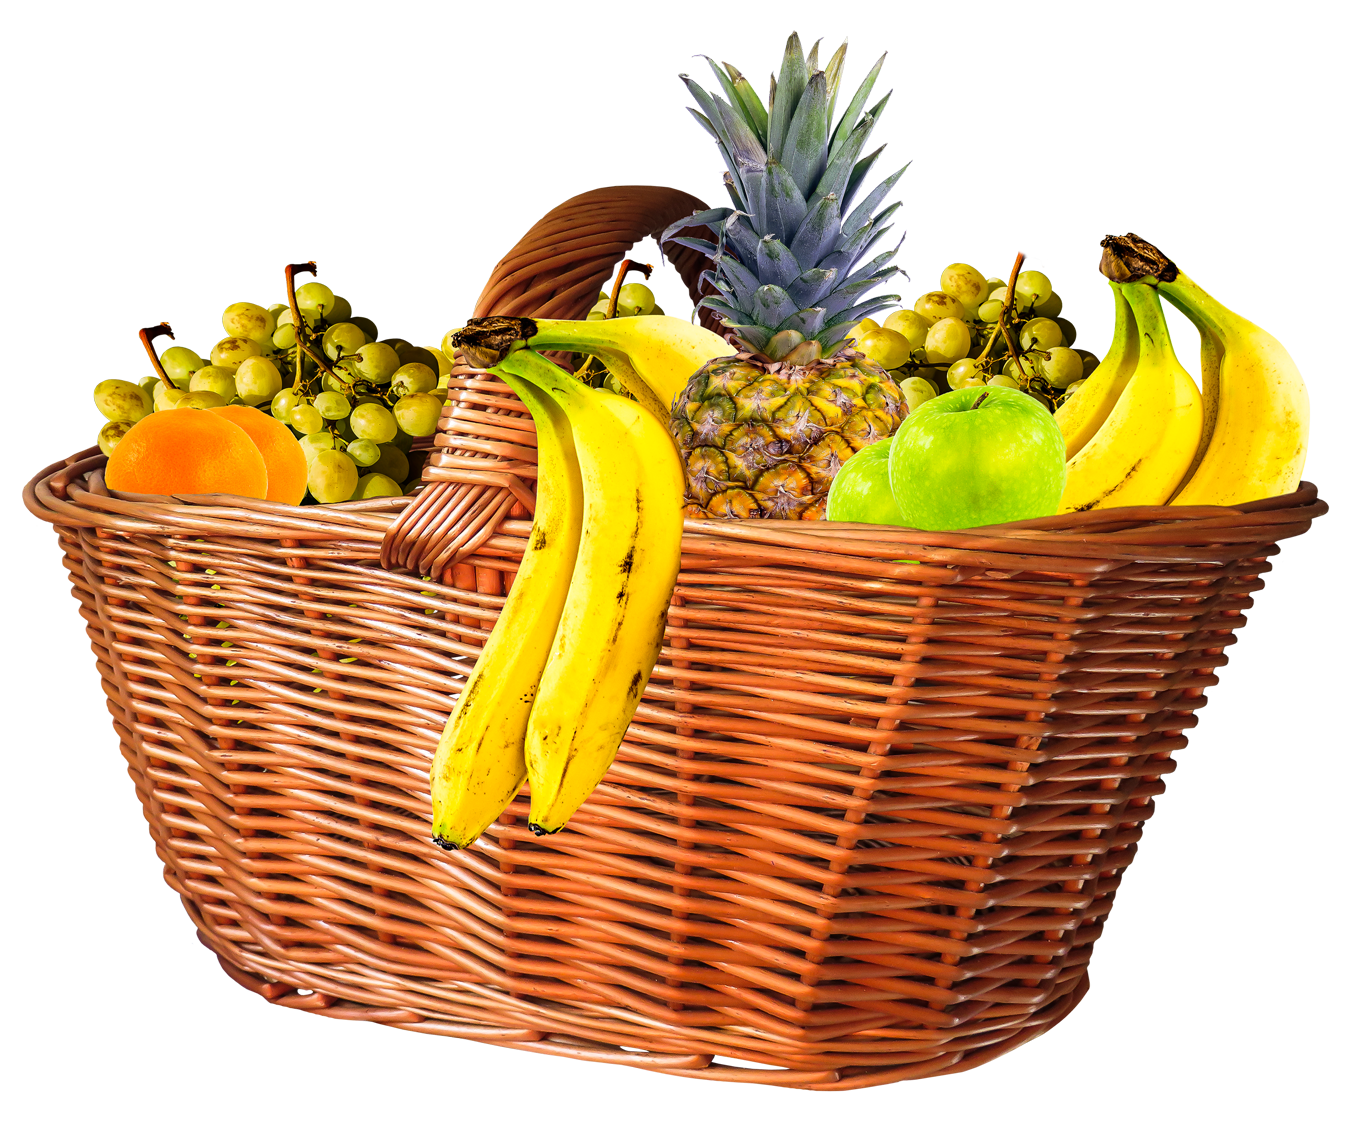 Fruit Basket PNG Image | Fruit basket, Green grapes, Free png